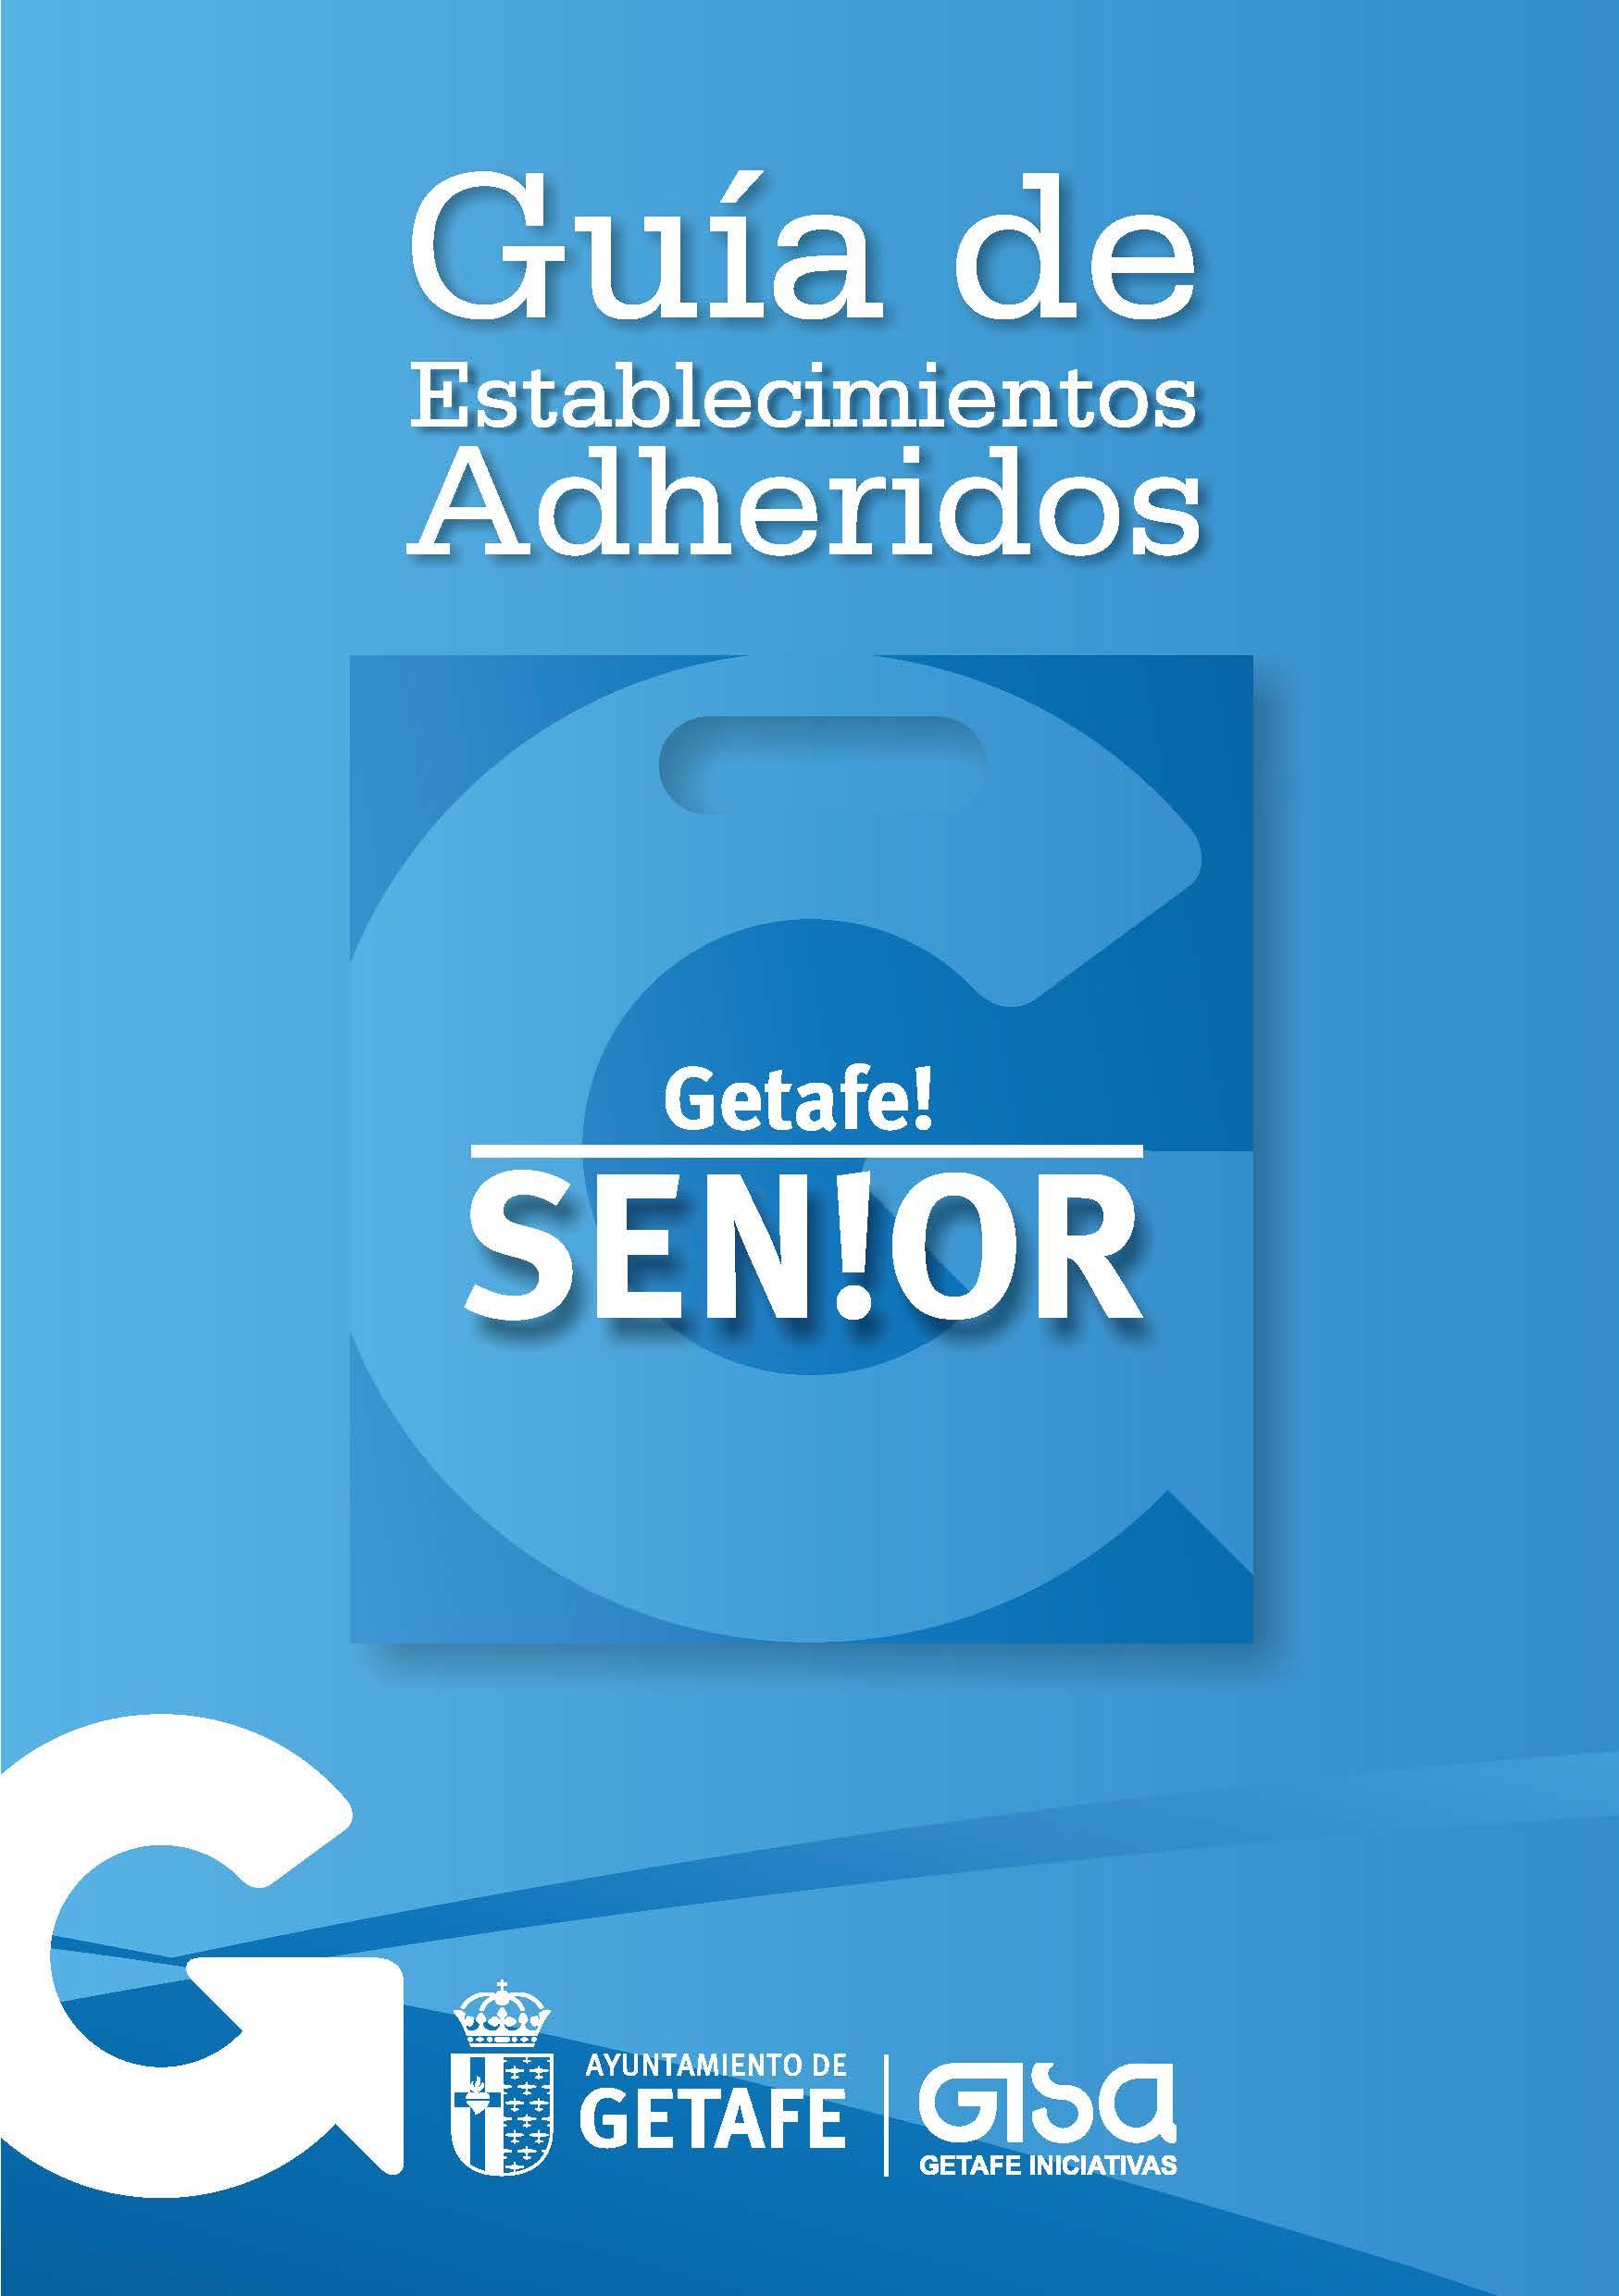 Guia GETAFE SENIOR (1).jpg